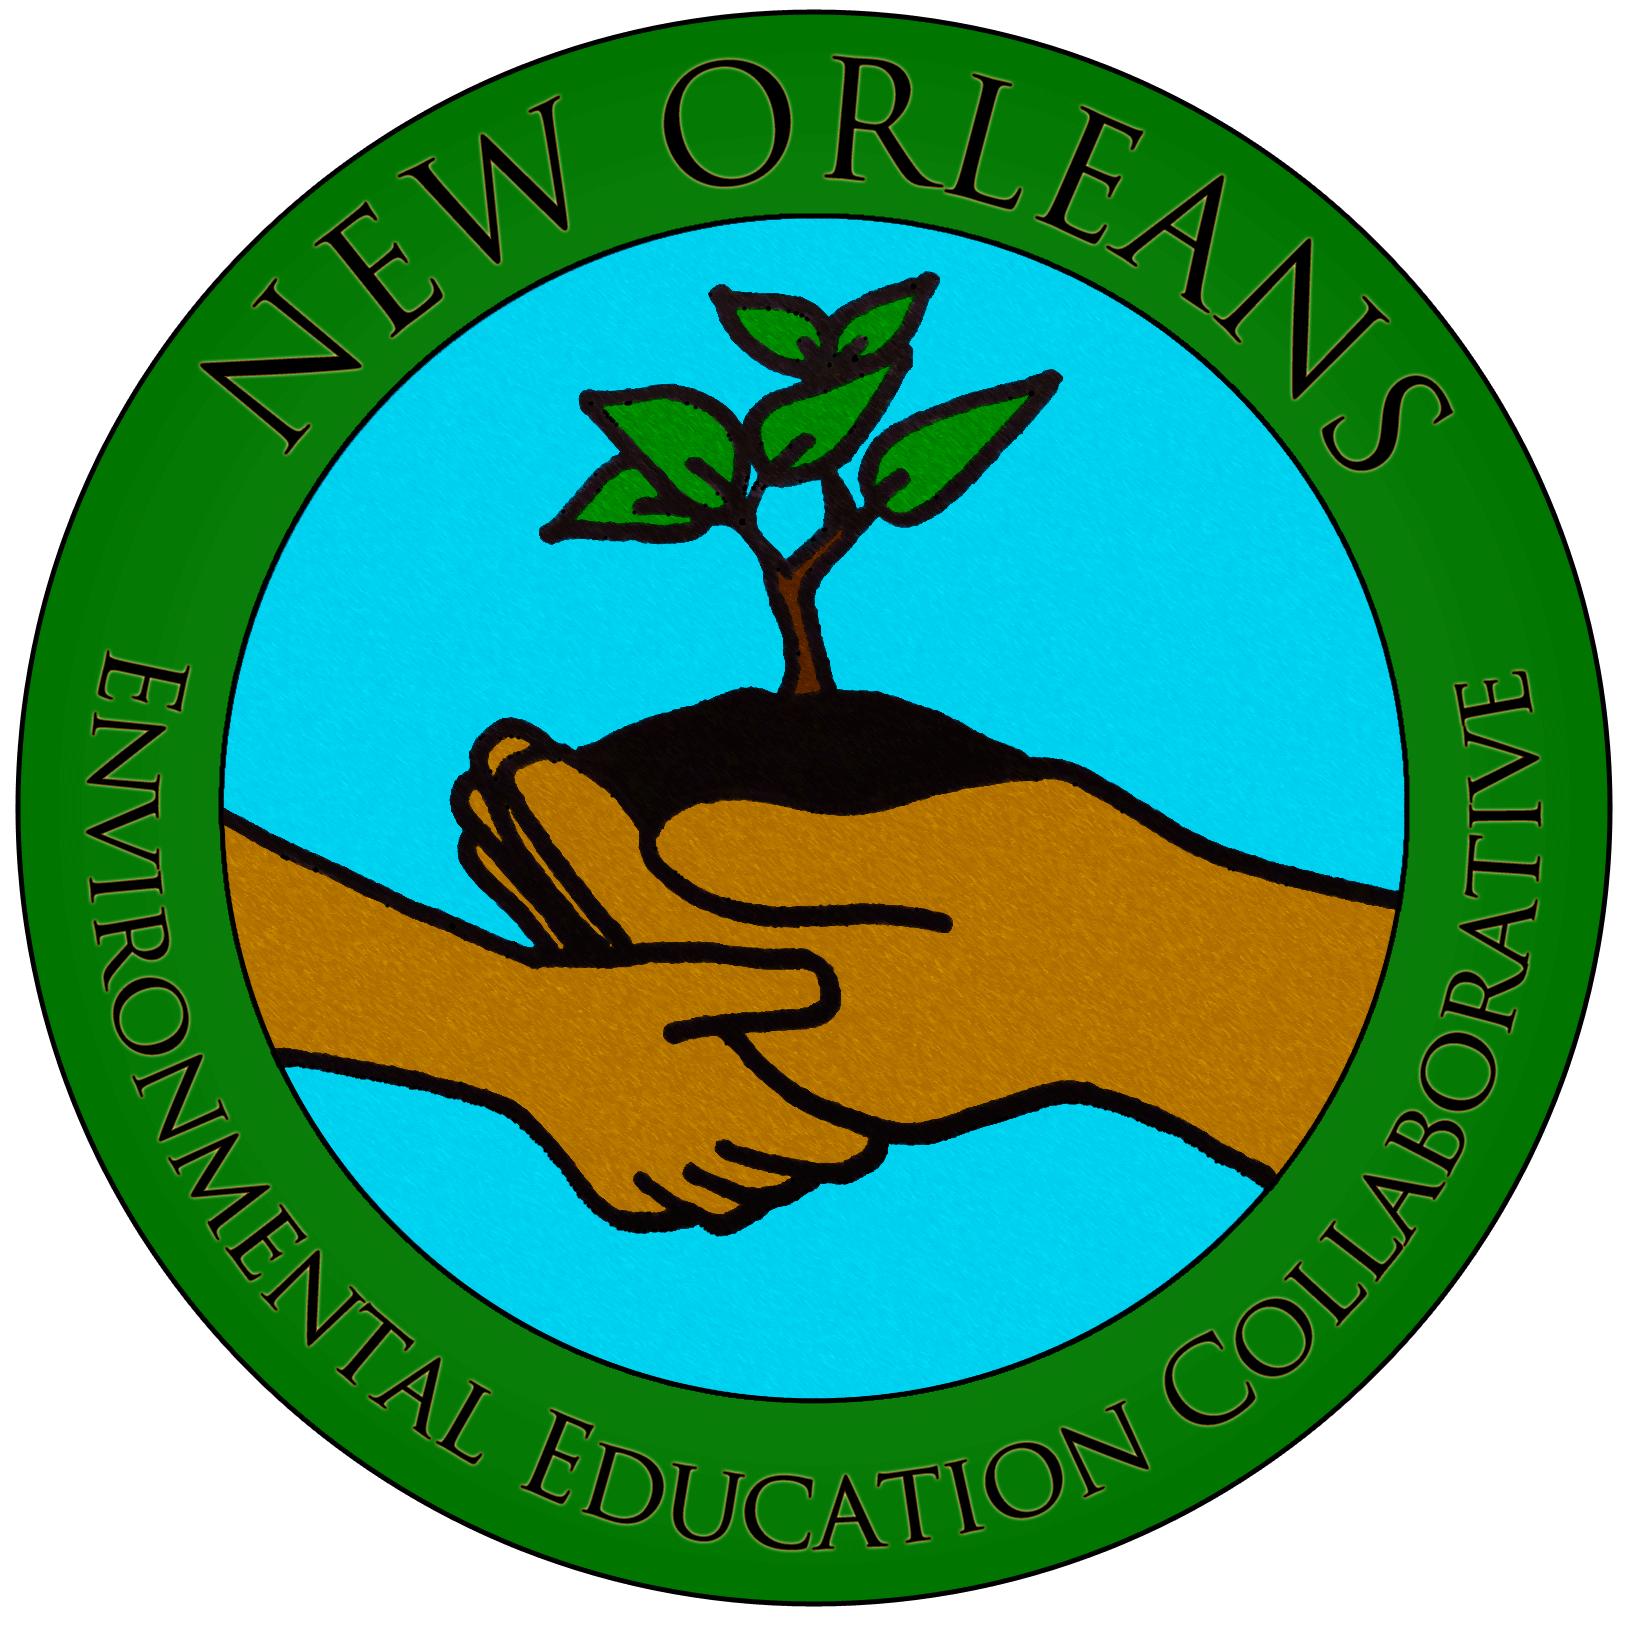 Environment clipart environment logo. Education environmental free on